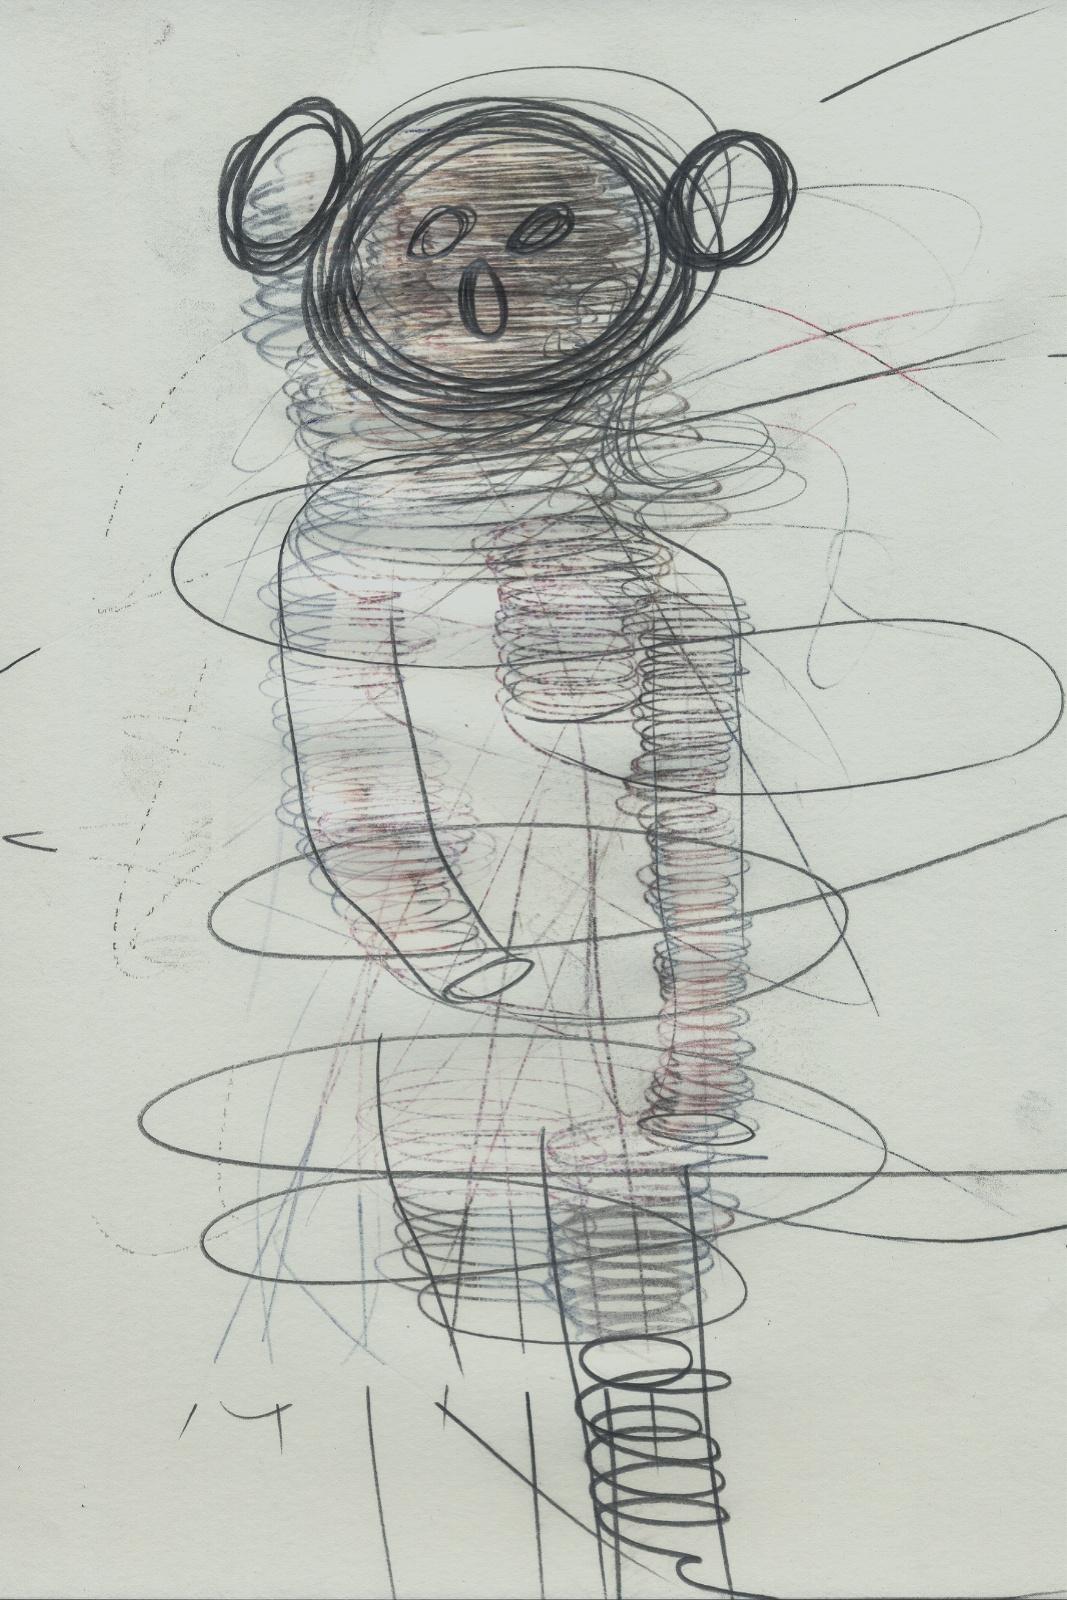 Spin #01, 2014, Lavender-Oil transferprint, pencil, 21 x 28 cm